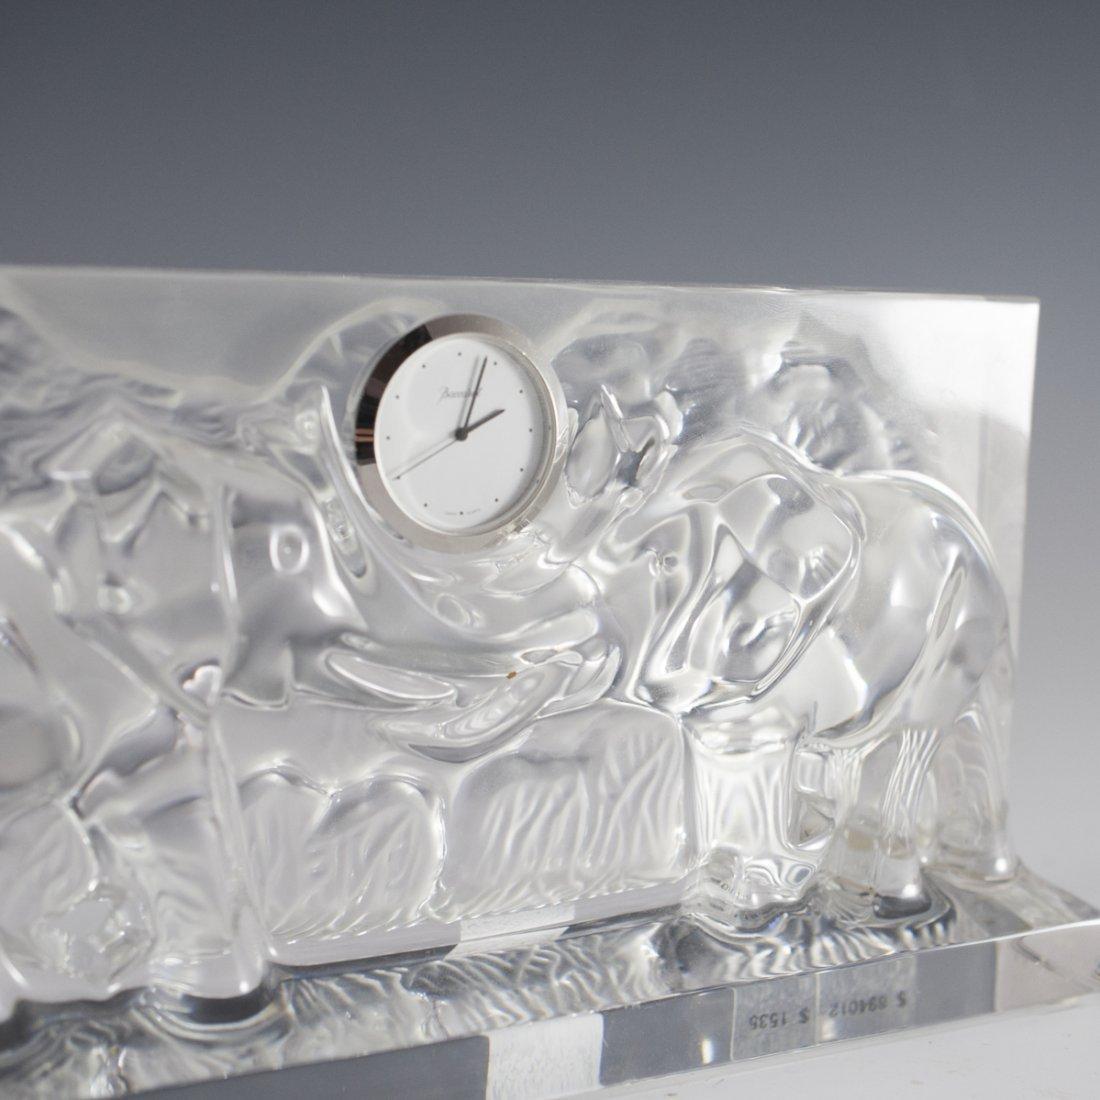 Baccarat Crystal Elephant Mantel Clock - 4